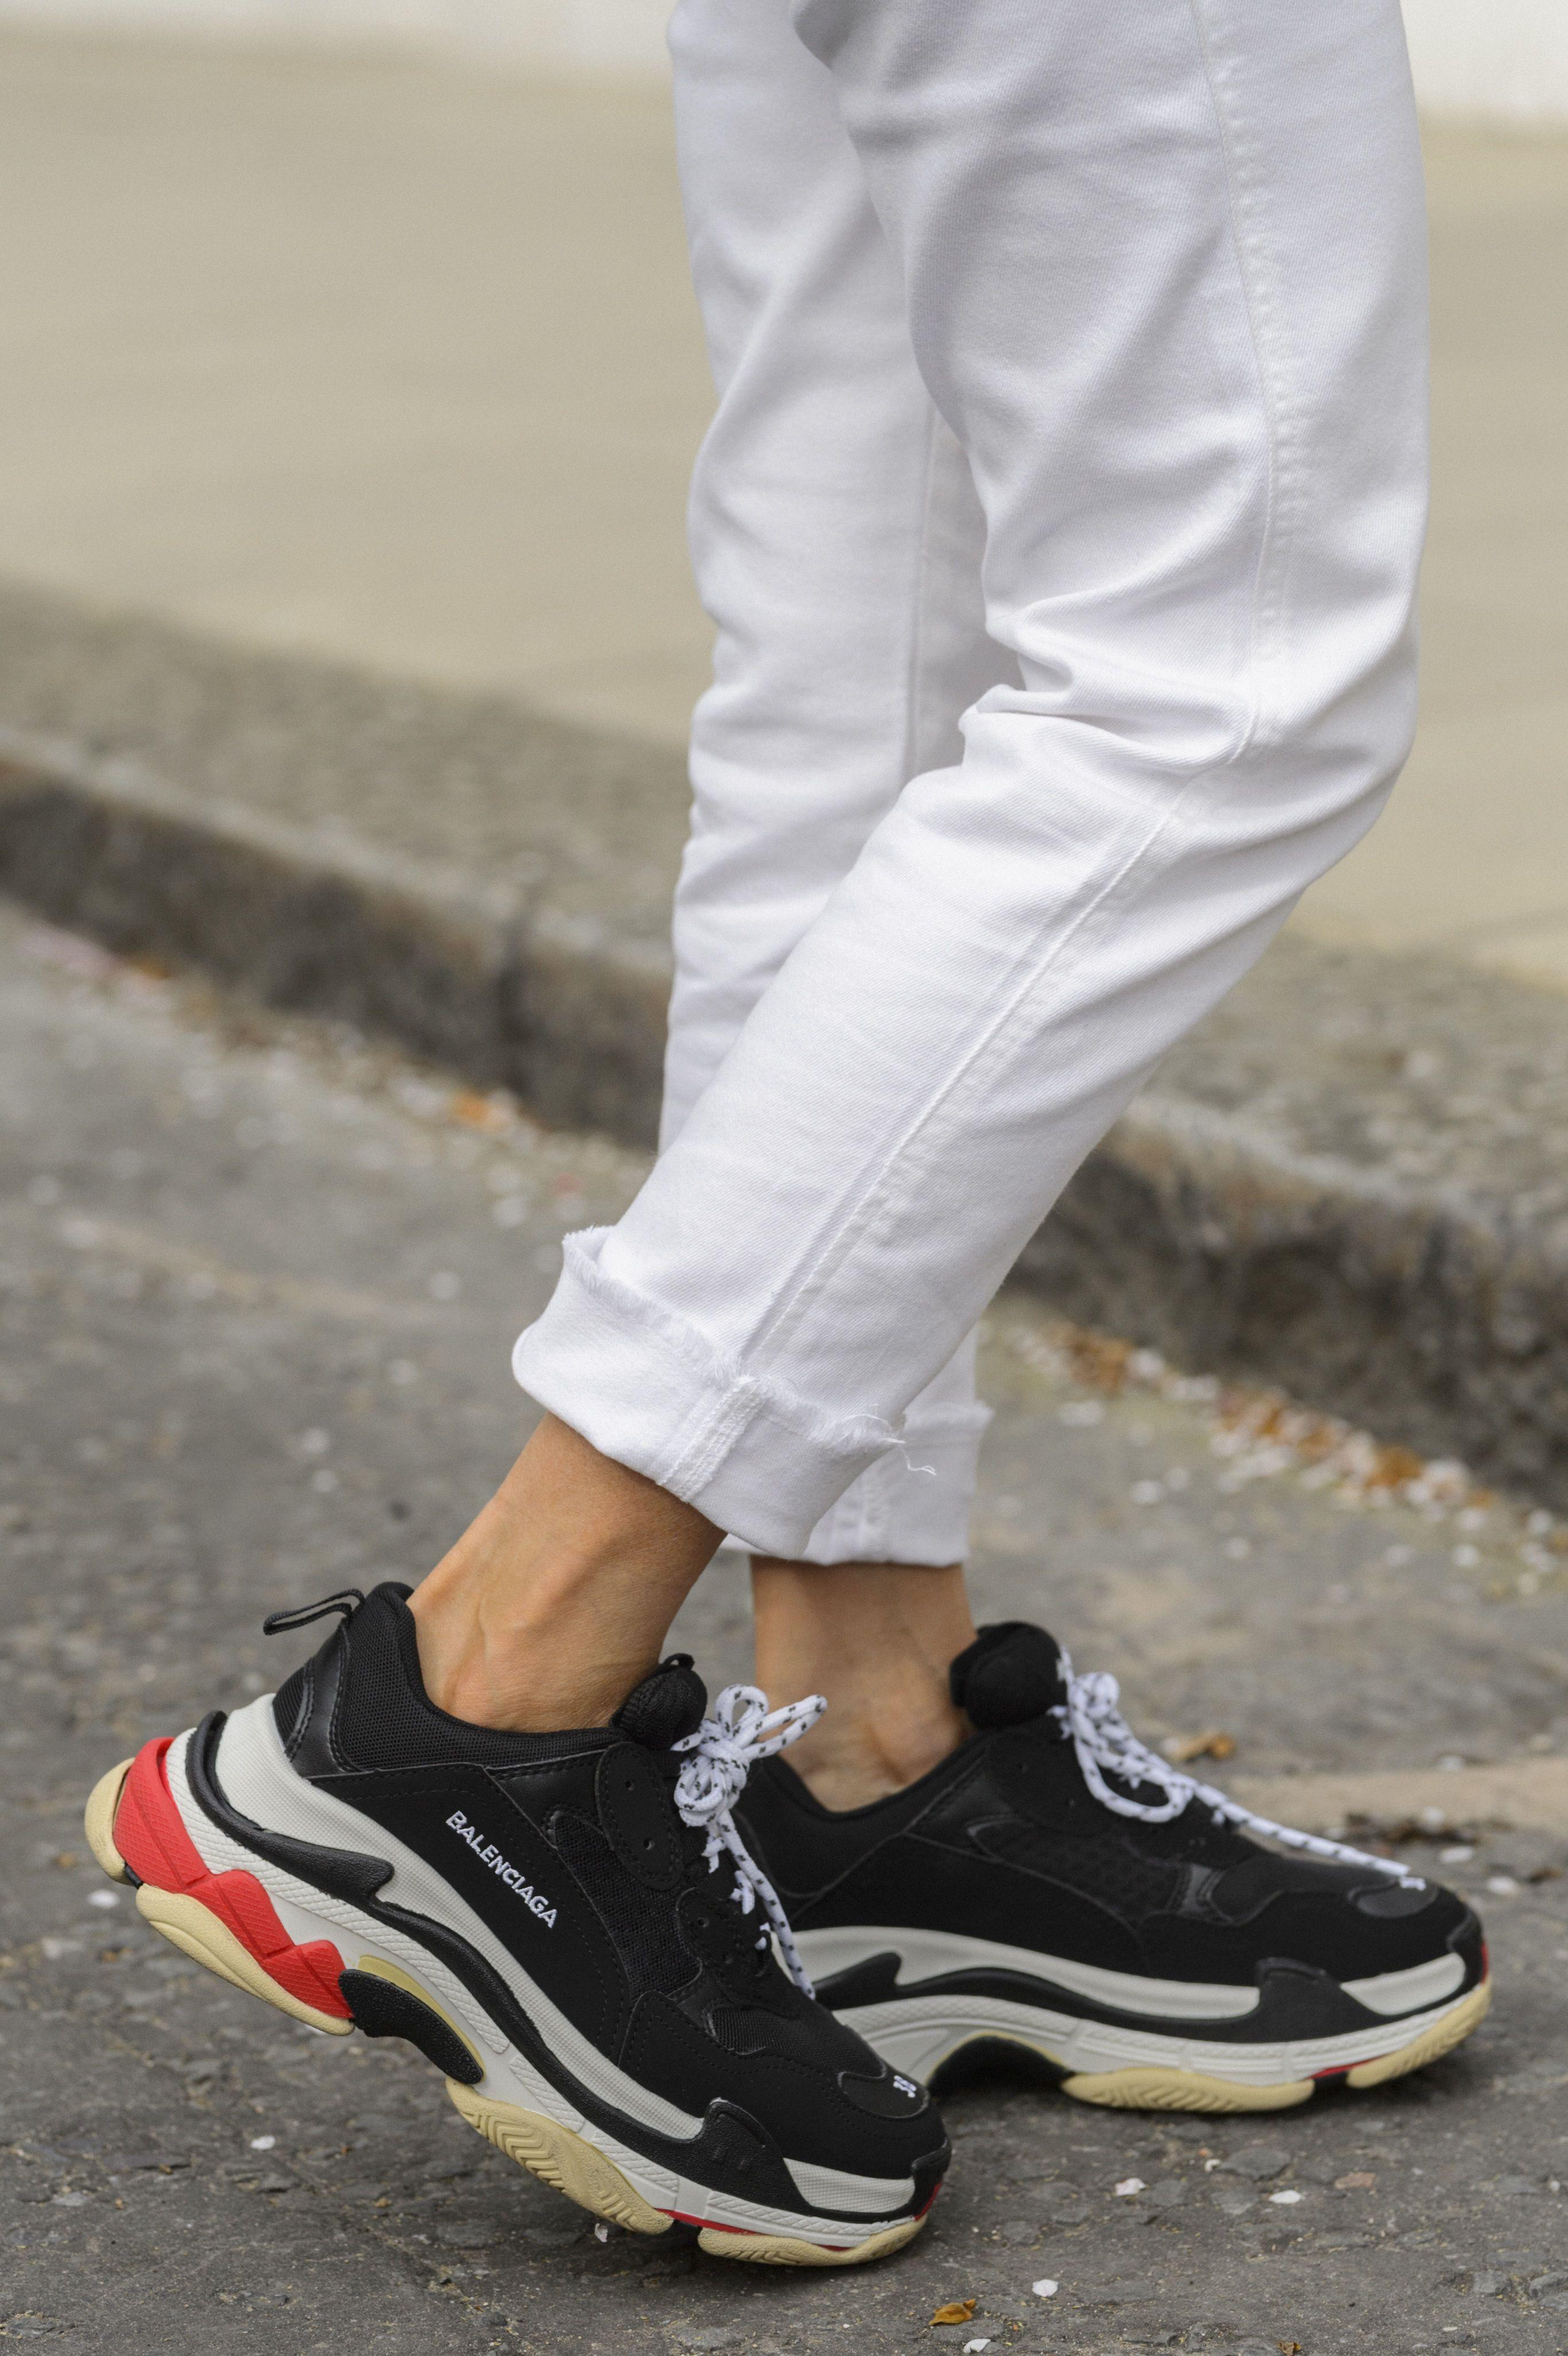 quality design 33e0d d19ac Maria Hatzistefanis - Mrs Rodial - Street Style - Balenciaga Triple S  Trainers